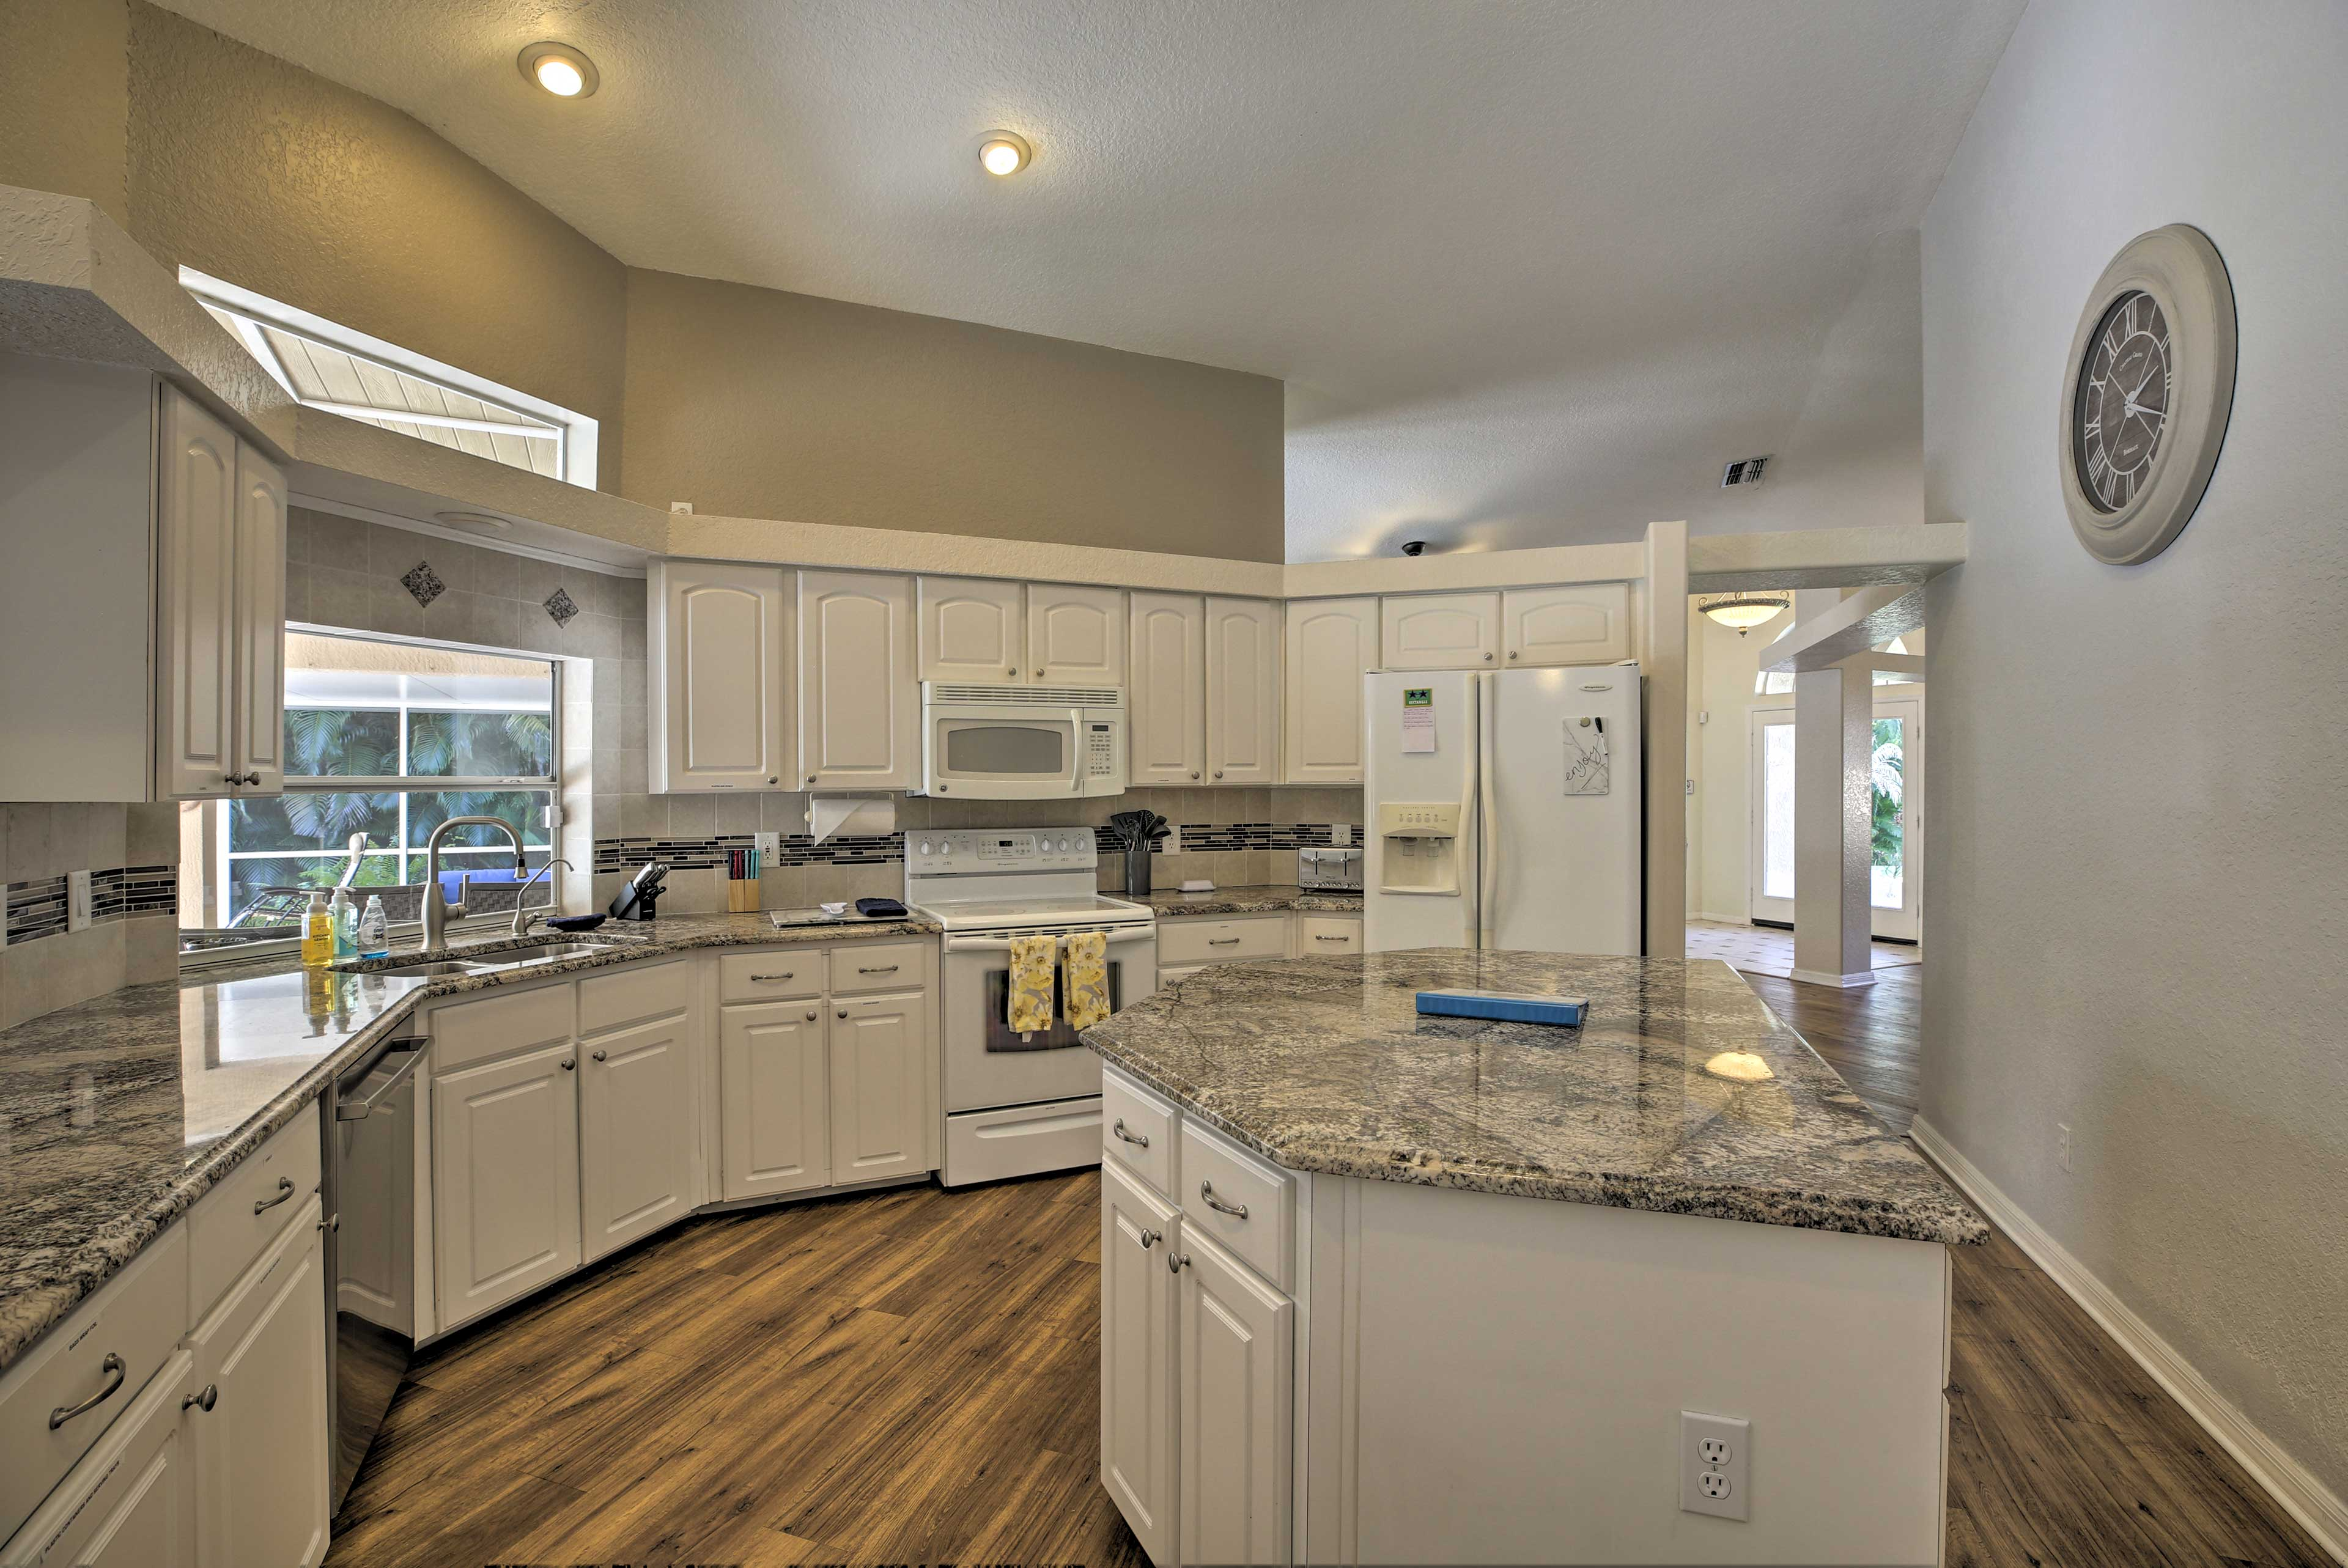 Fully Equipped Kitchen | Dishwasher | Tile Backsplash